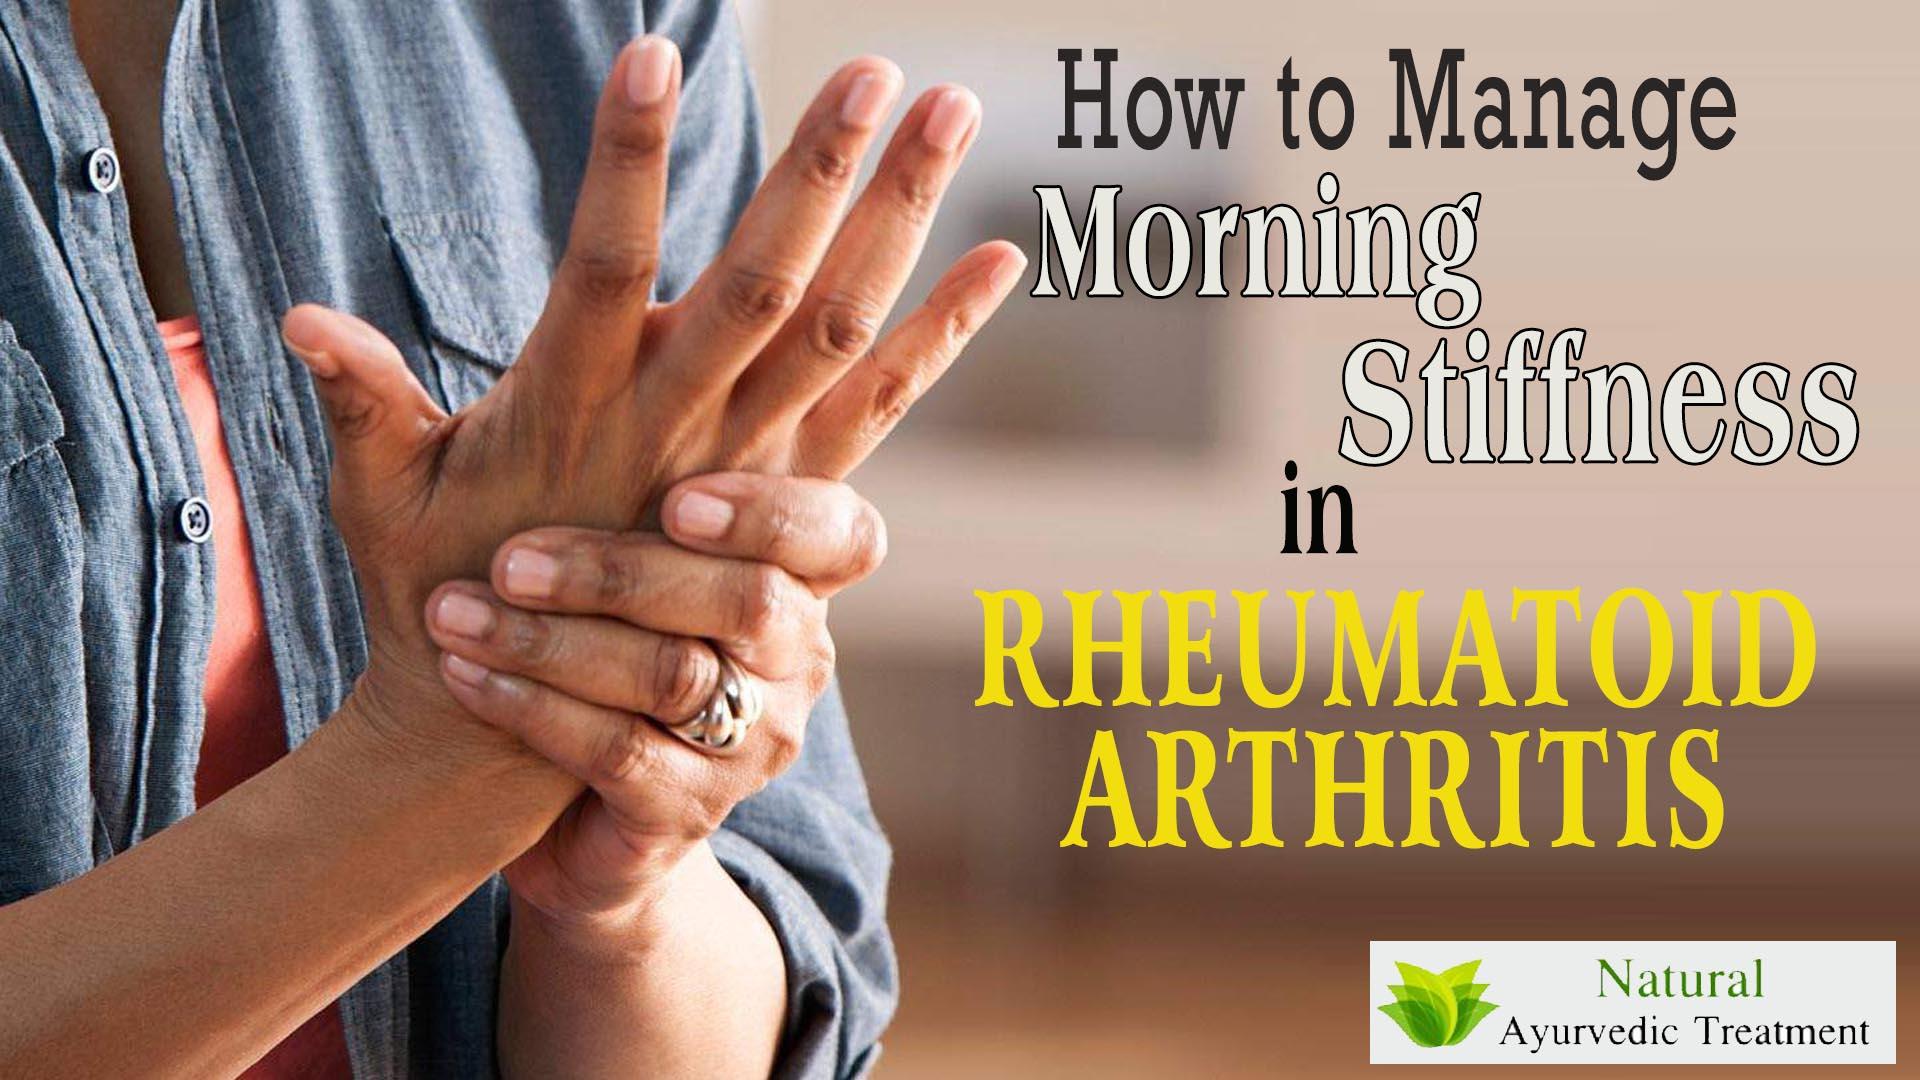 How to Manage Morning Stiffness in Rheumatoid Arthritis?